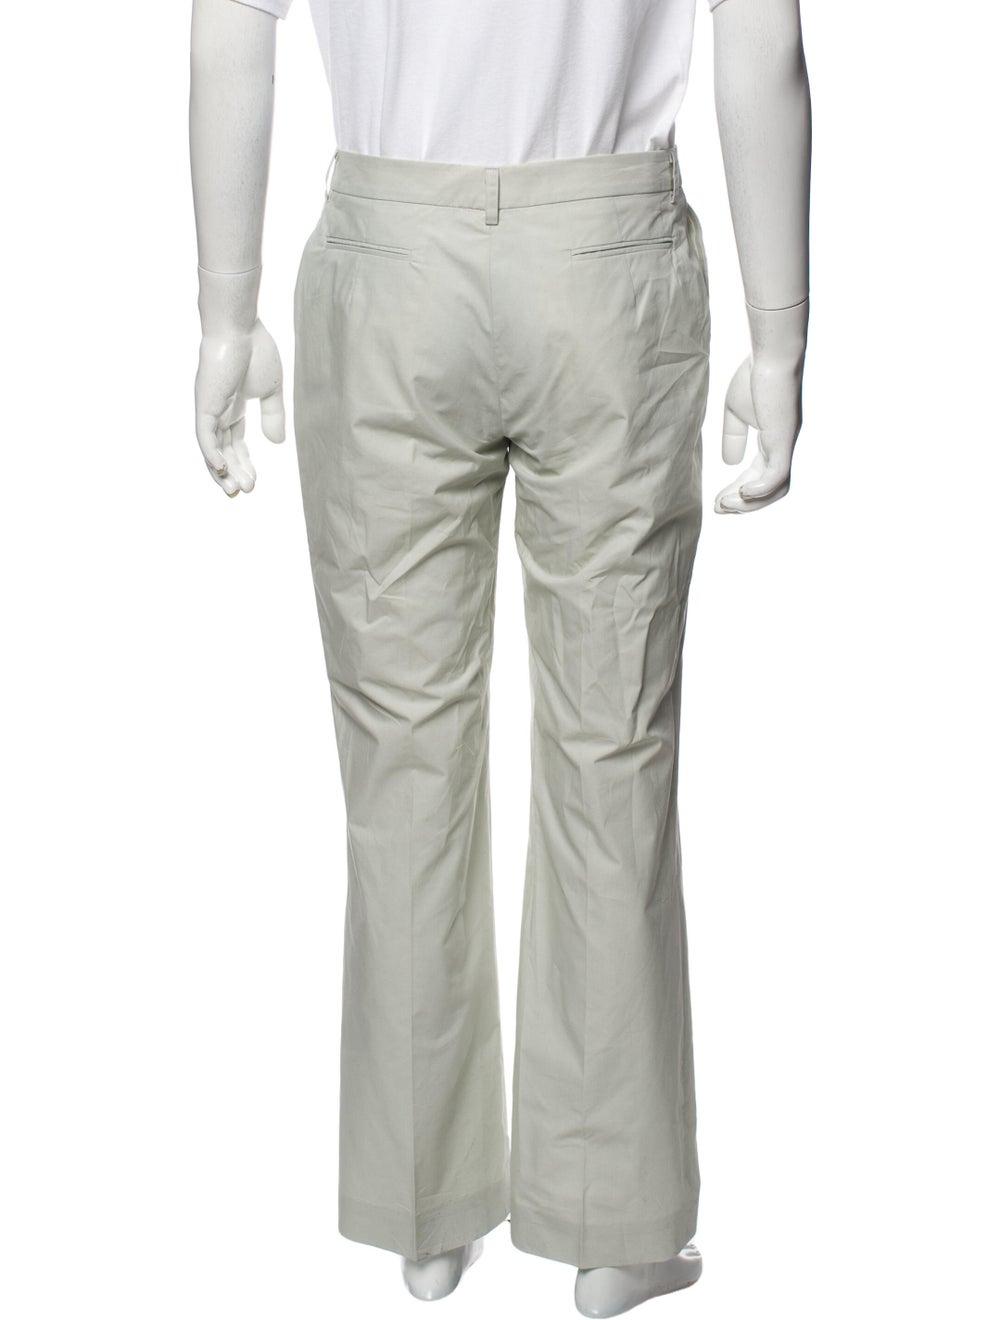 Asprey Pants Green - image 3